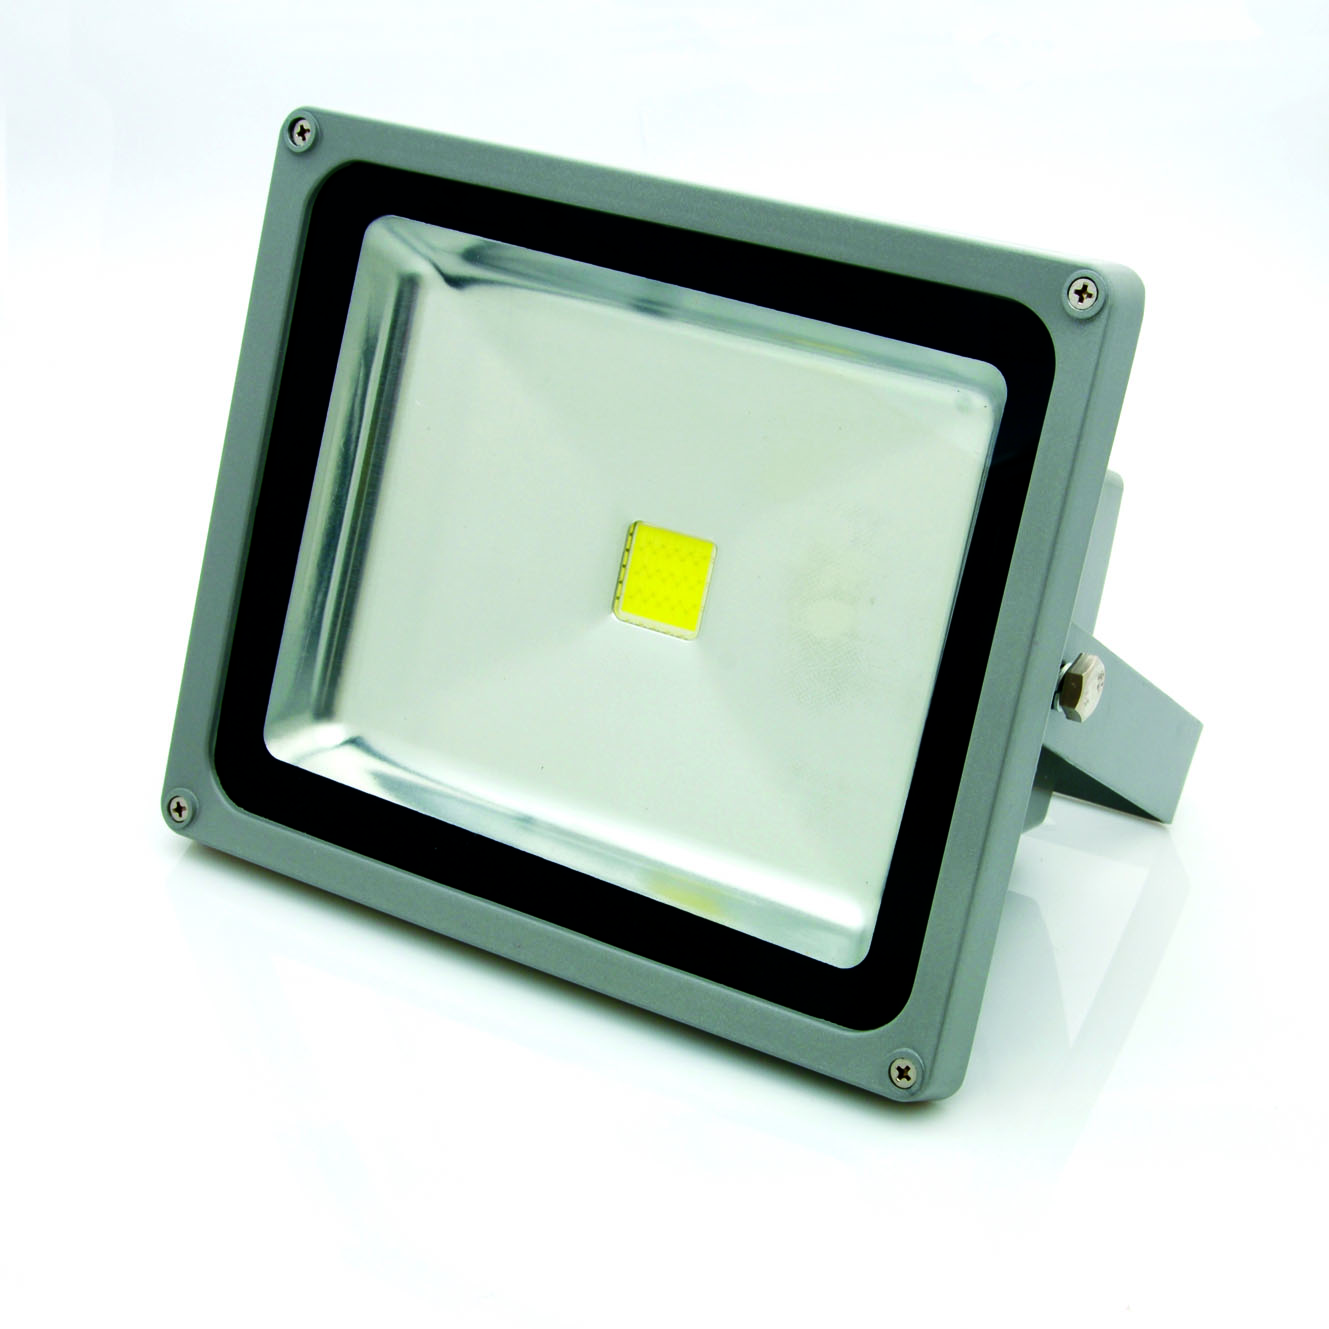 PROIECTOR LED EXTERIOR CLASIC 10W LUMINA ALBA RECE